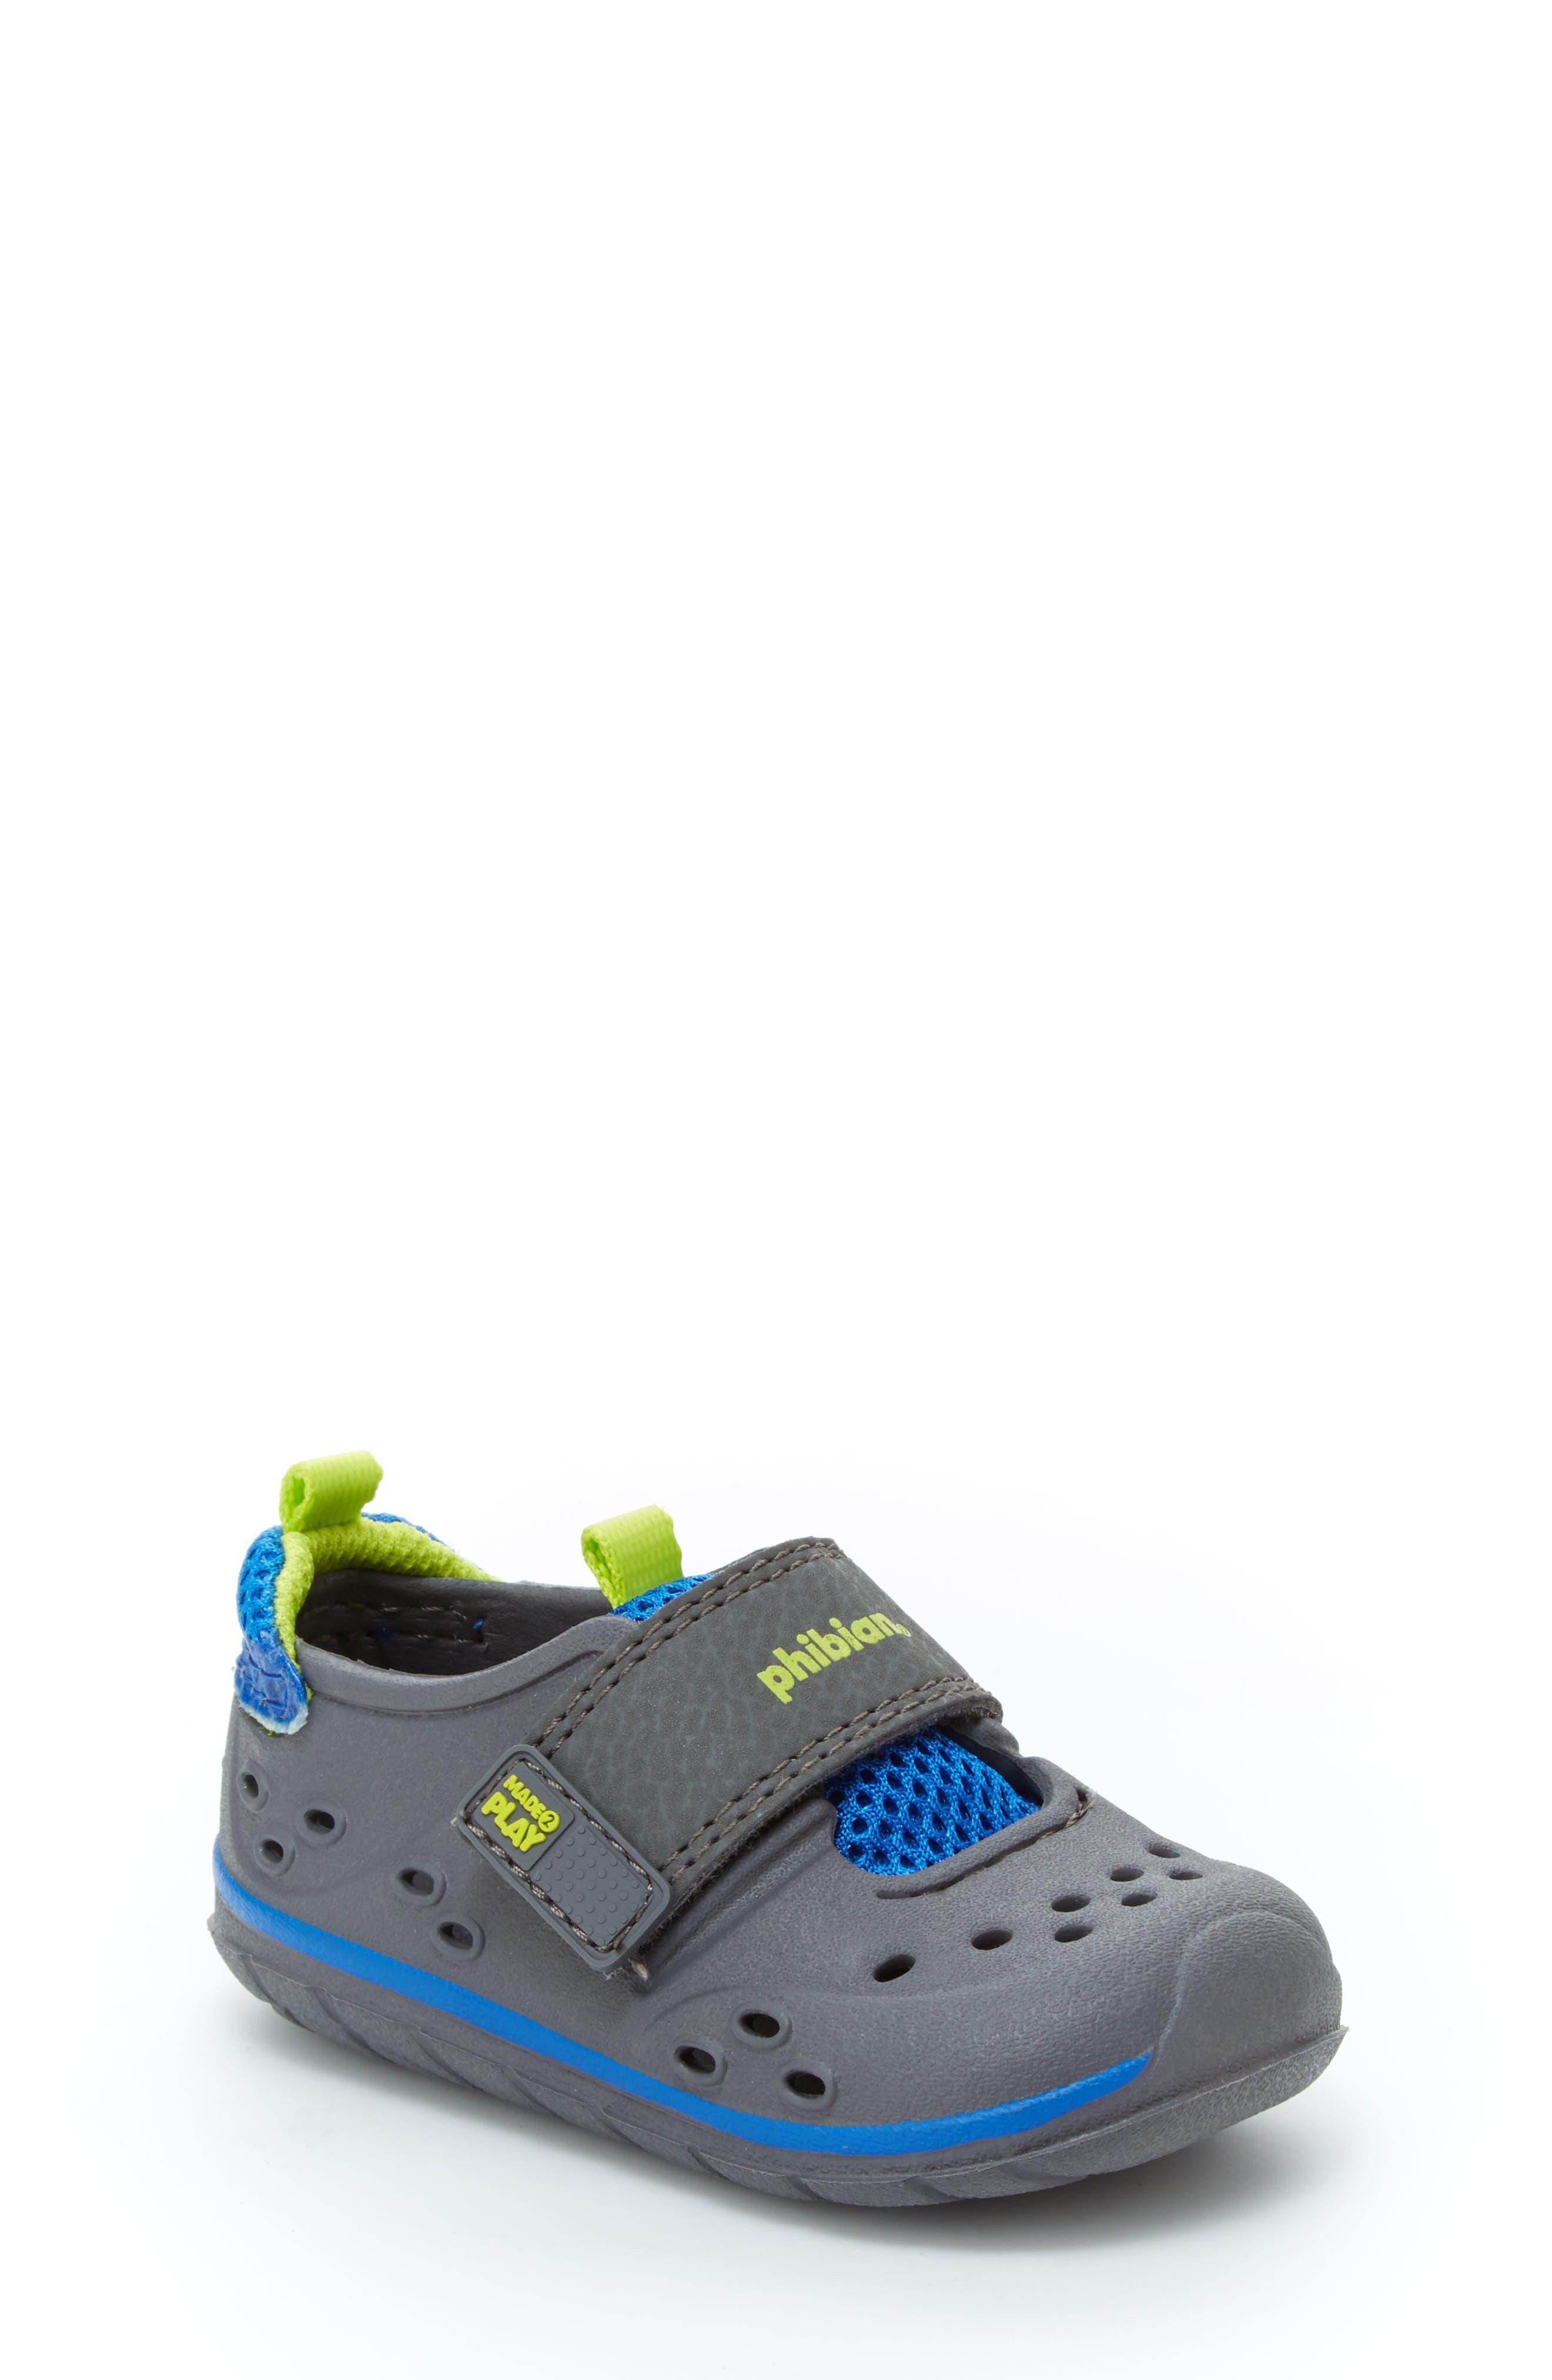 Made2Play<sup>®</sup> Phibian Sneaker,                             Main thumbnail 1, color,                             GREY/ GREY